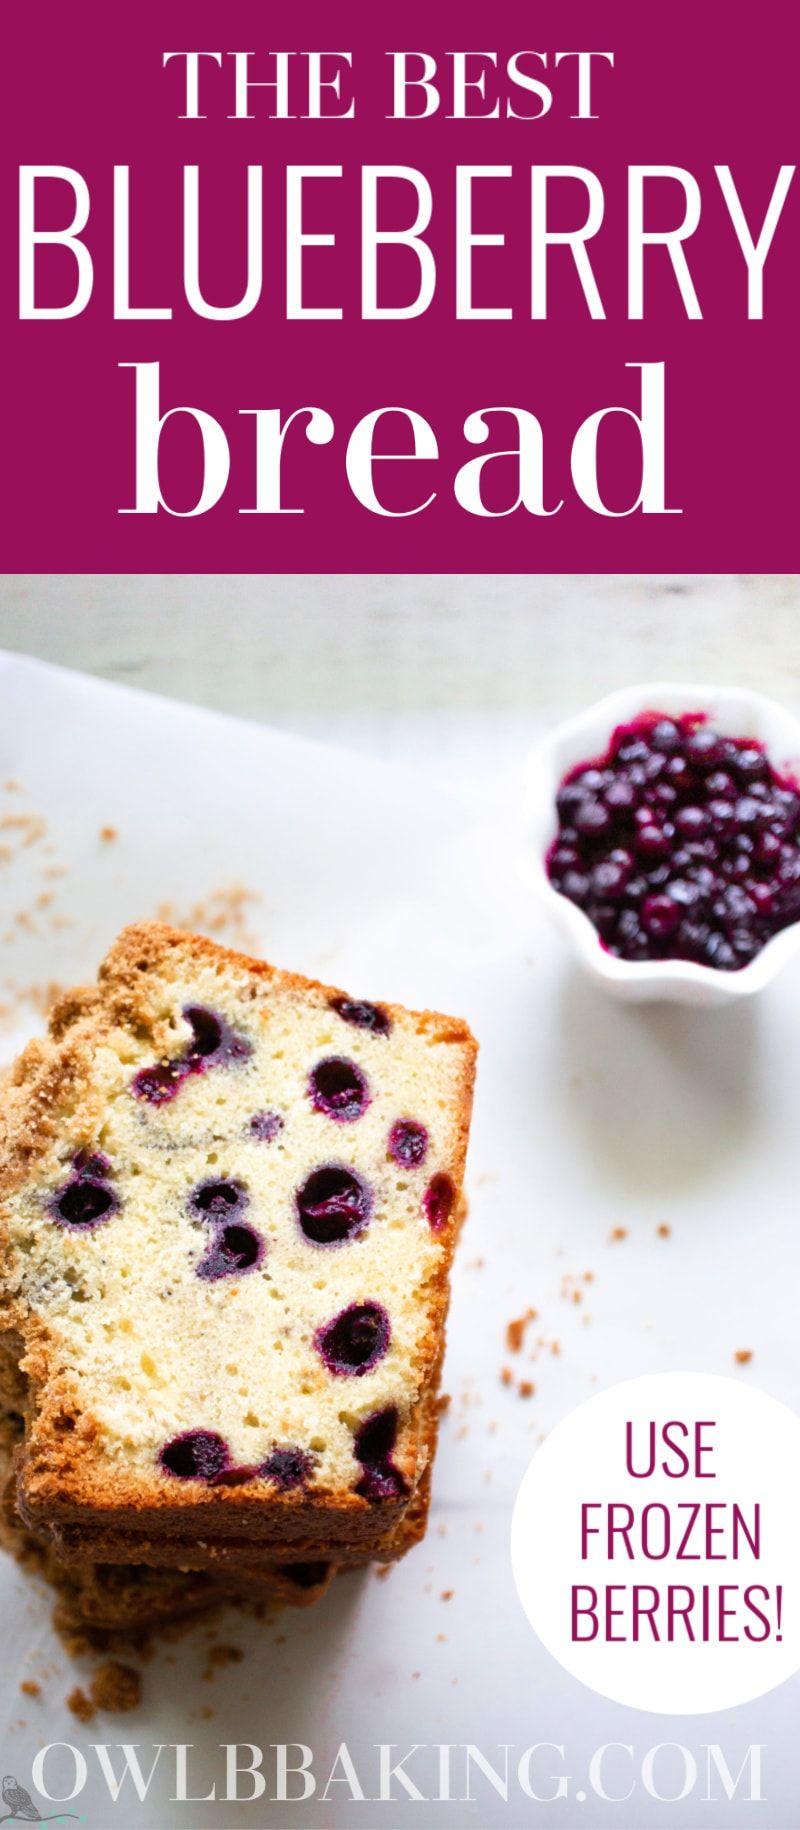 Blueberry Bread Recipe In 2020 Blueberry Bread Dessert Recipes Easy Dessert Recipes